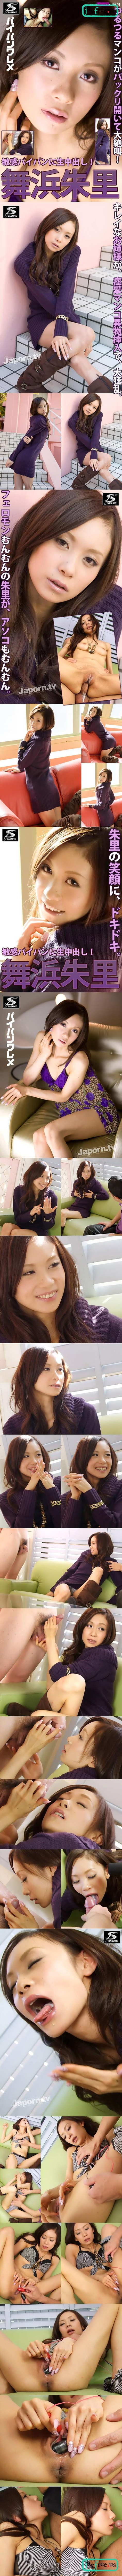 [SSKJ-009] サスケジャム Vol.9 パイパンワレメ デラックス : 舞浜朱里 - image SSKJ-009a on https://javfree.me